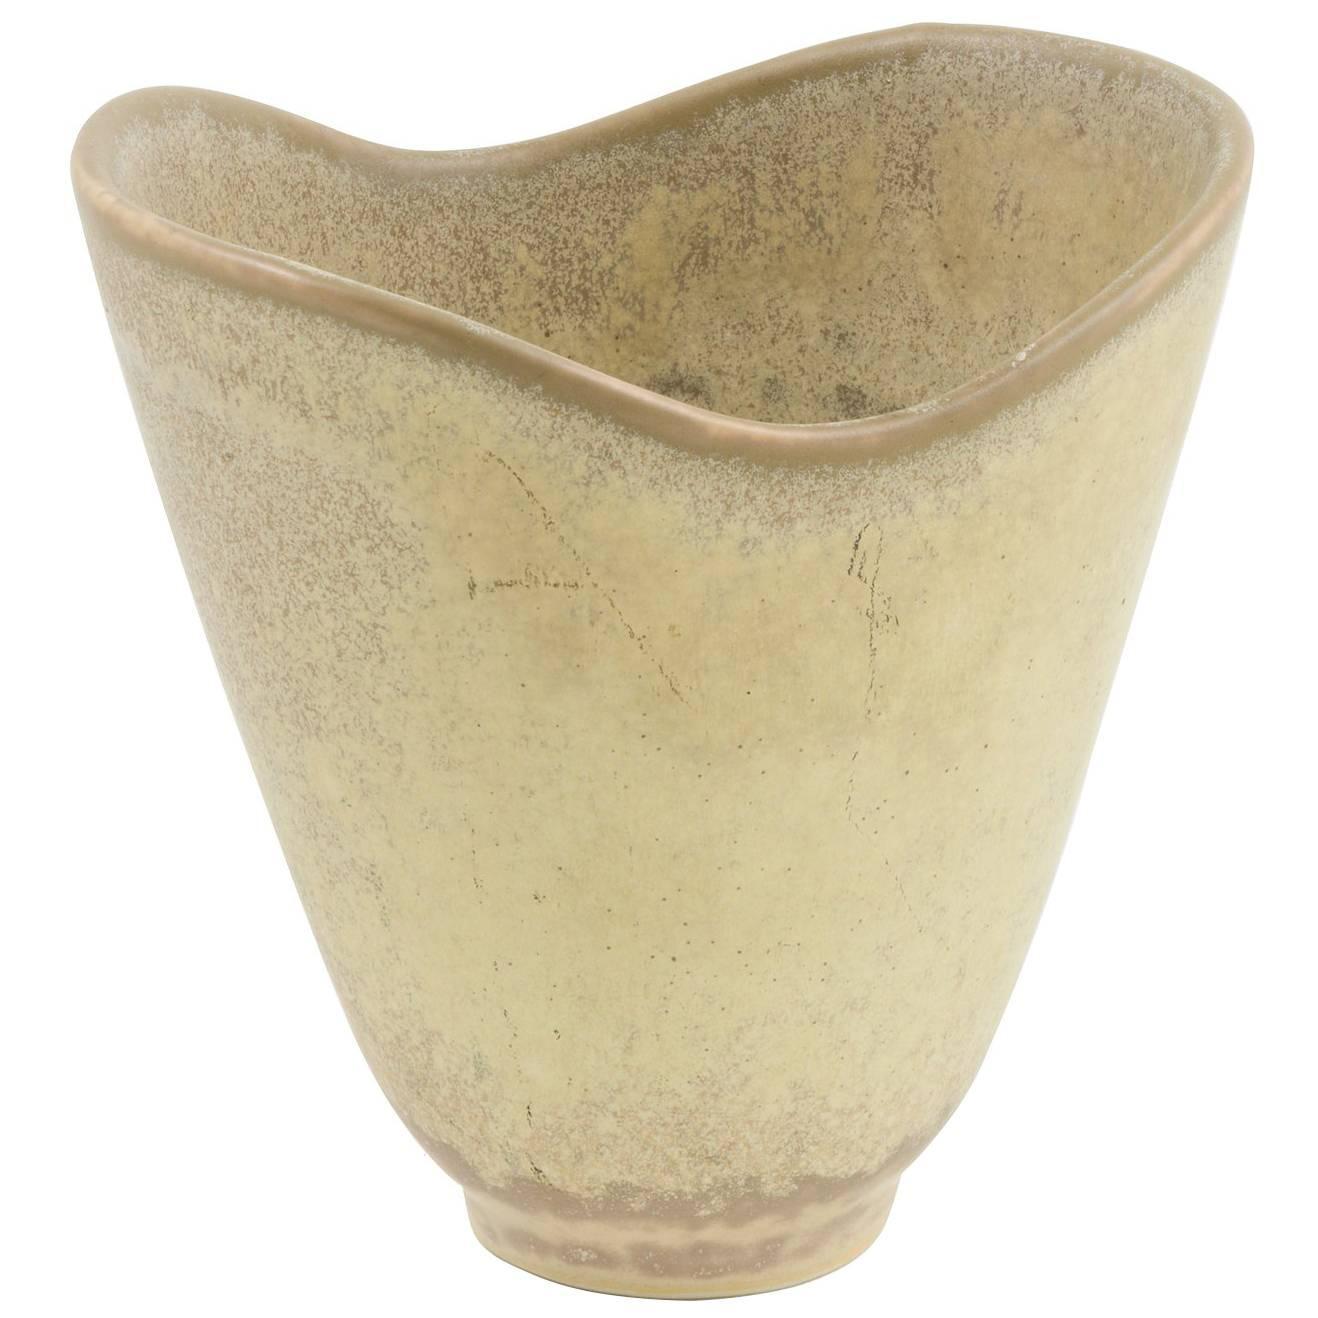 Carl Harry Stalhane Stoneware Vase for Rörstrand, Sweden, 1950s